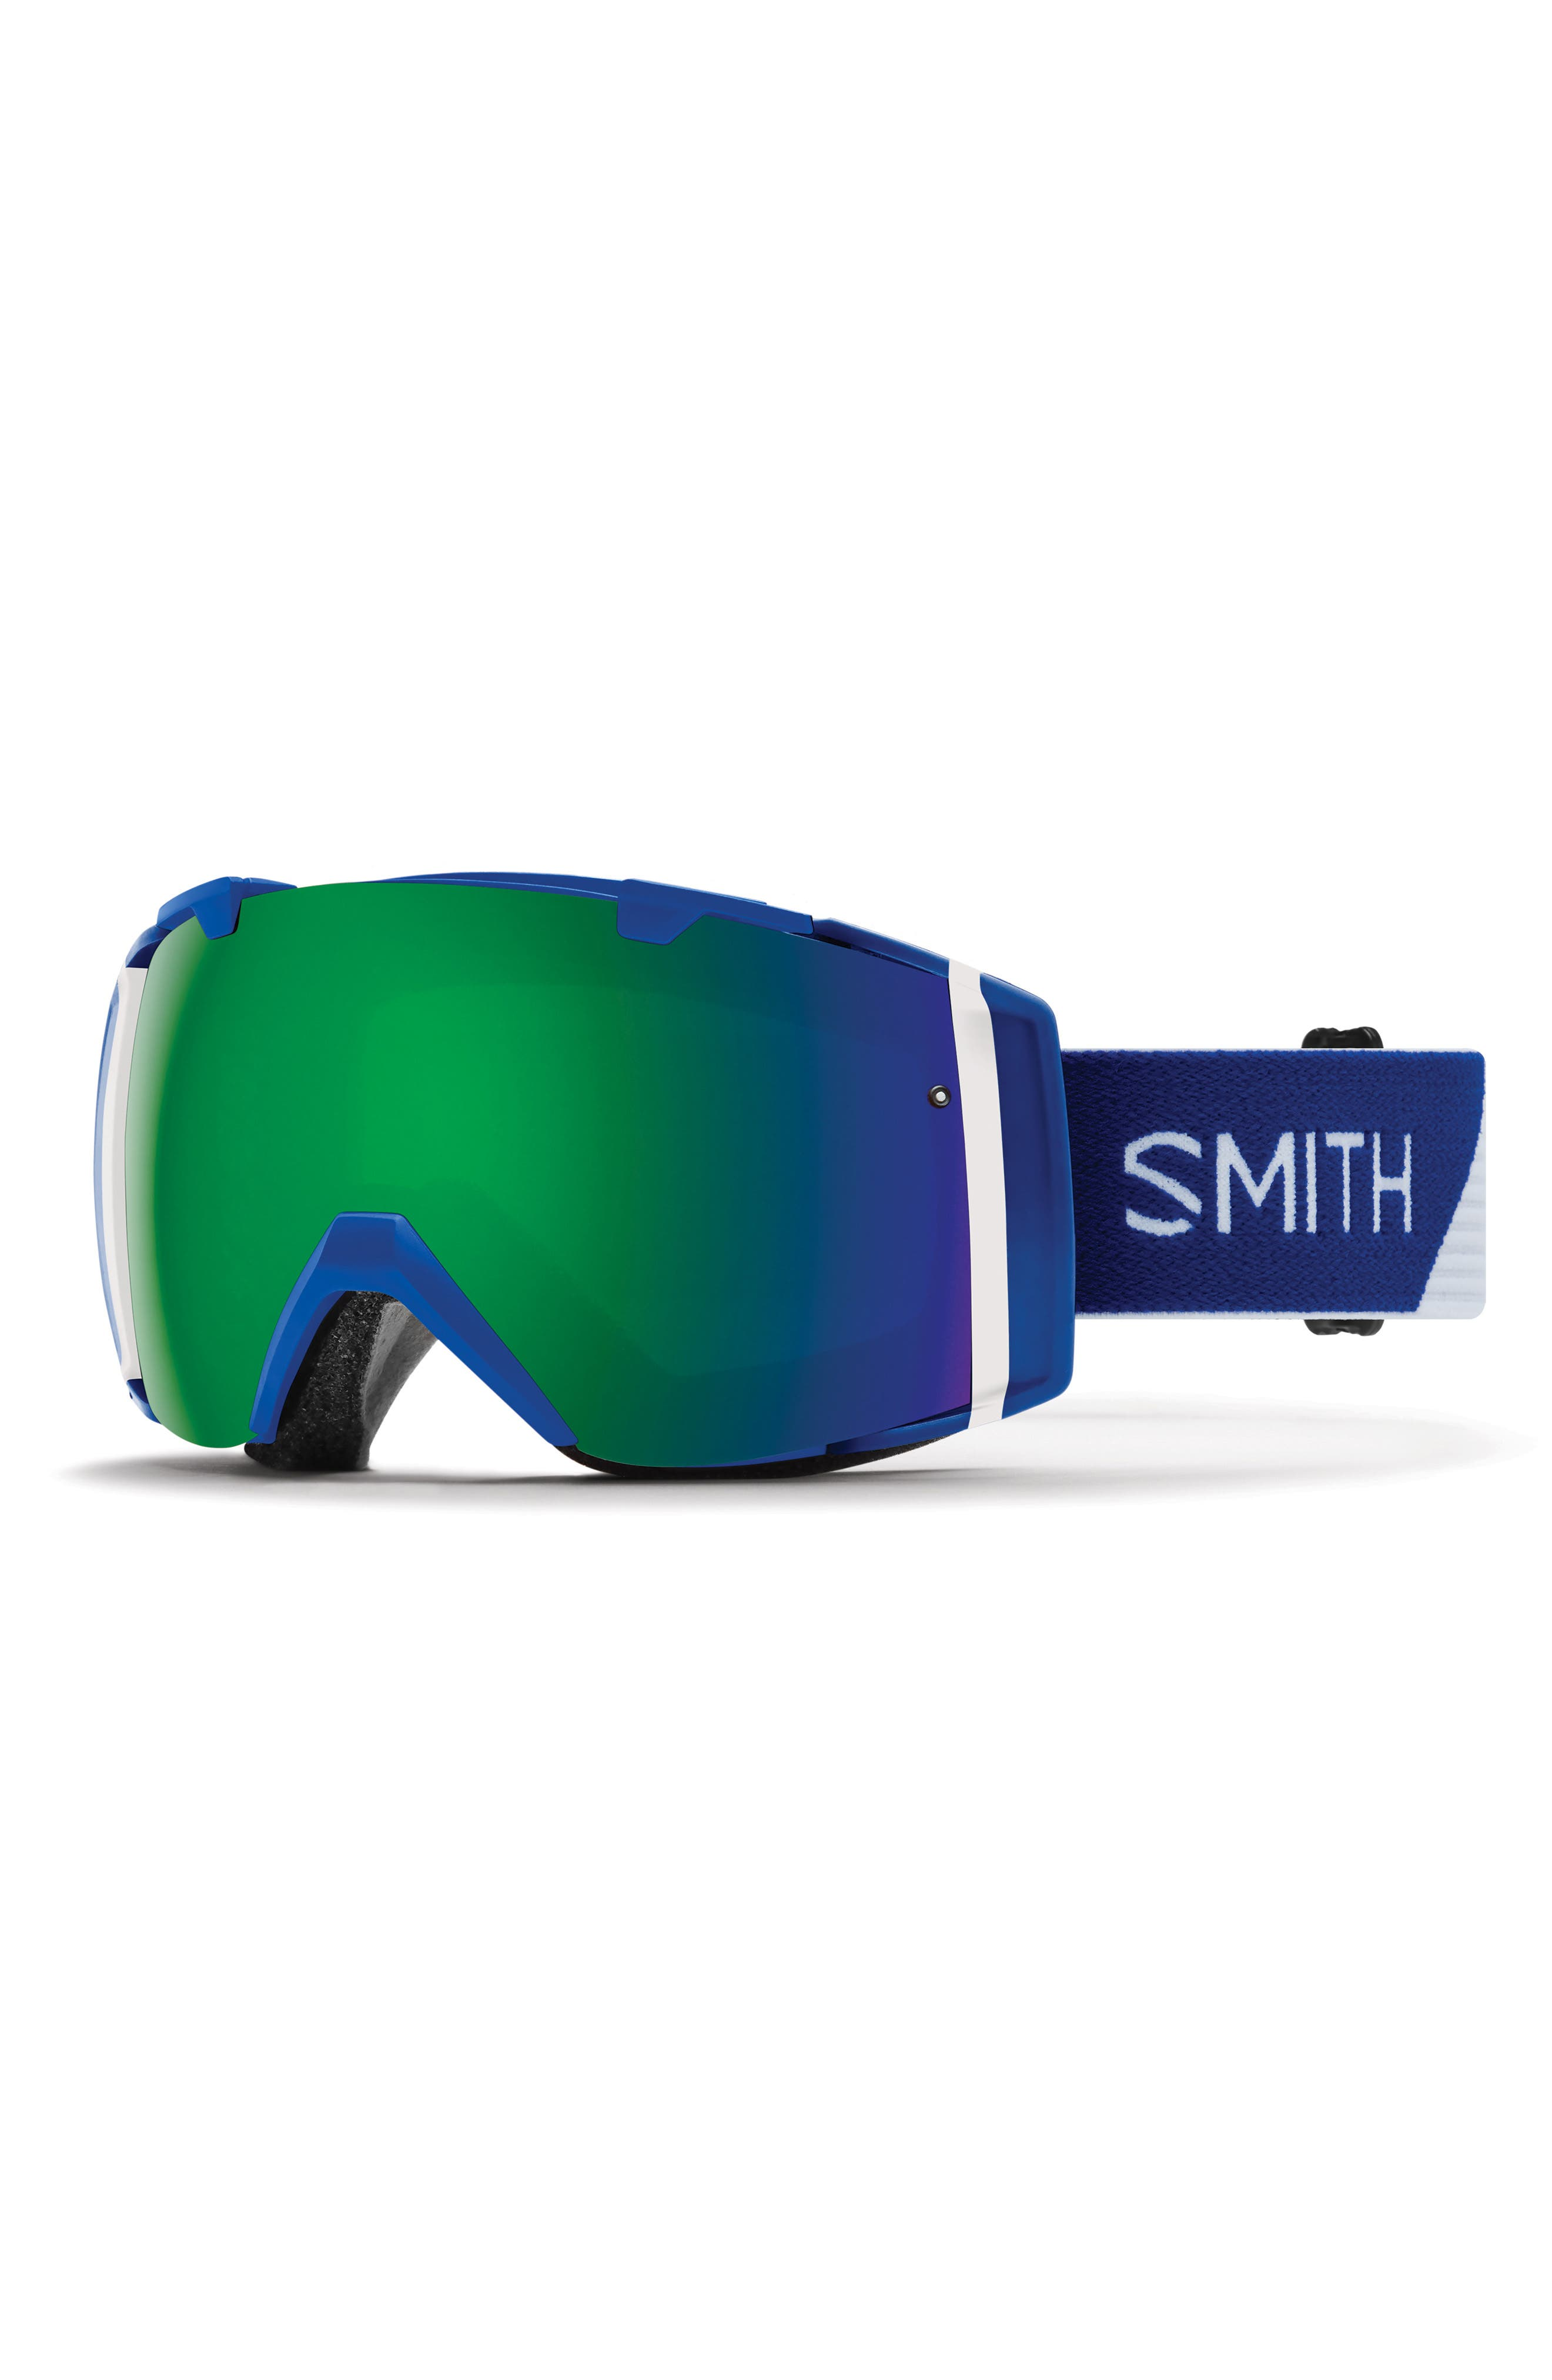 I/OX 205mm Chromapop Snow Goggles,                             Main thumbnail 3, color,